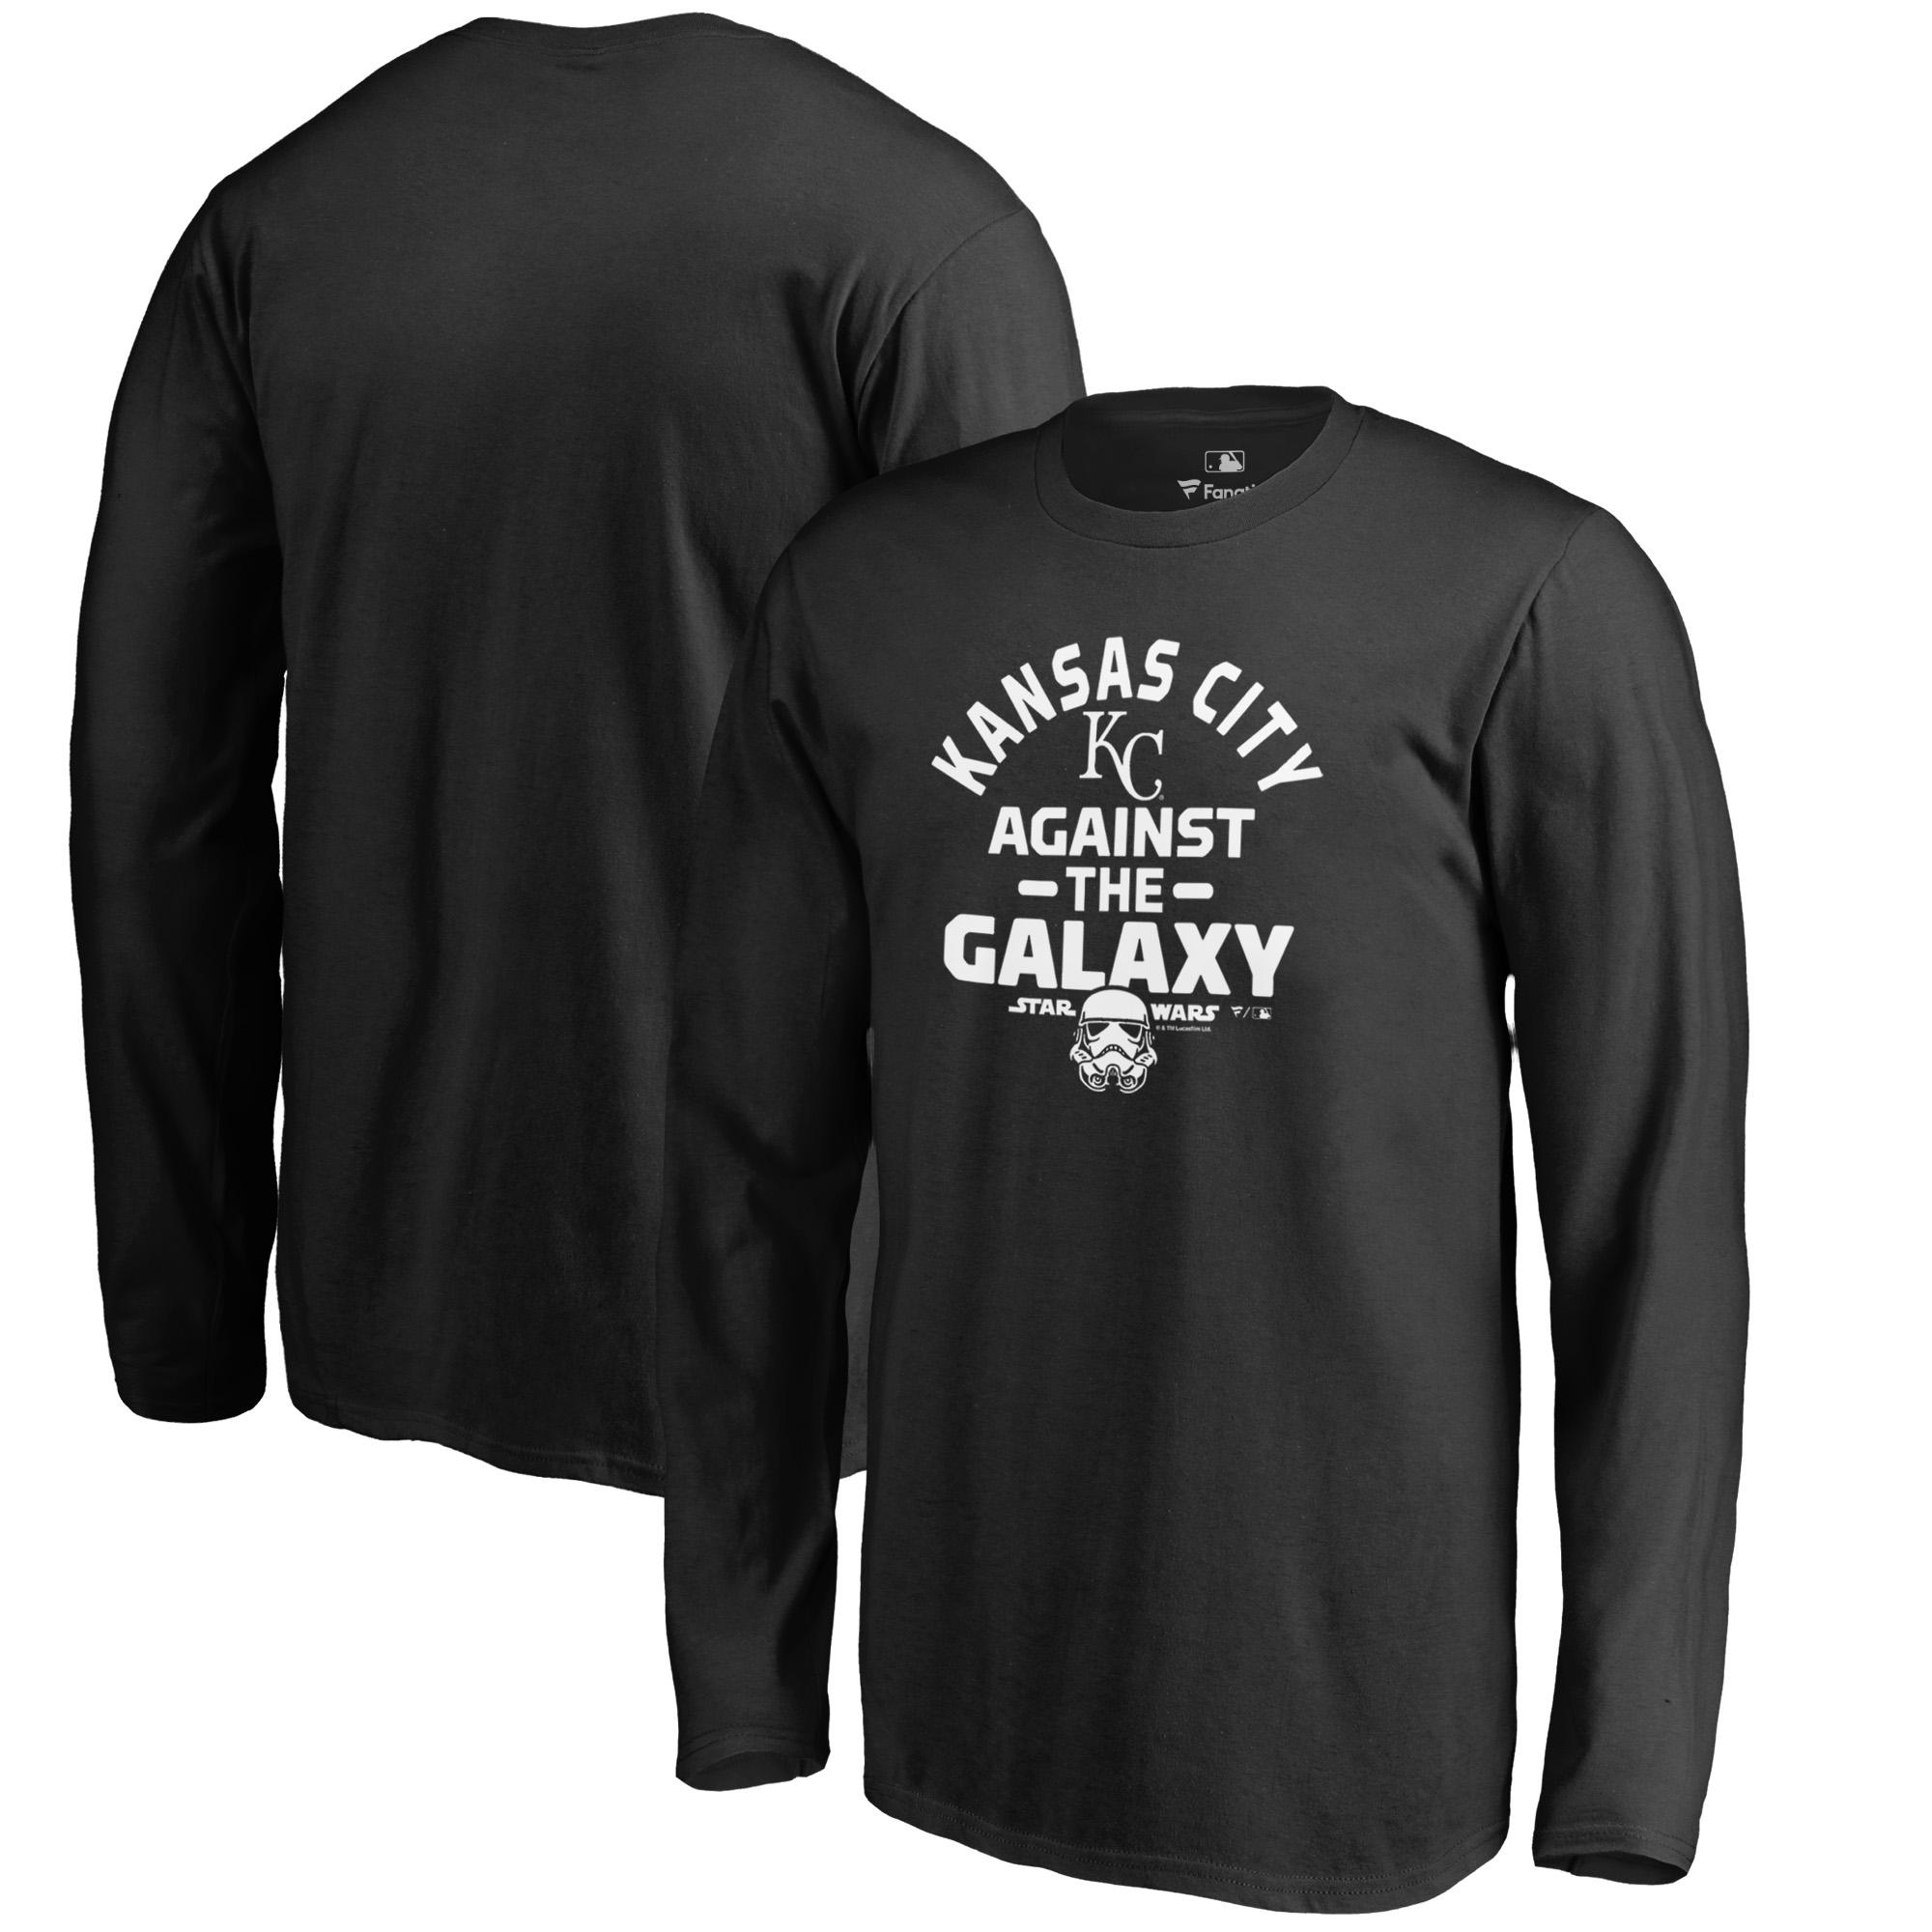 Kansas City Royals Fanatics Branded Youth MLB Star Wars Against The Galaxy Long Sleeve T-Shirt - Black